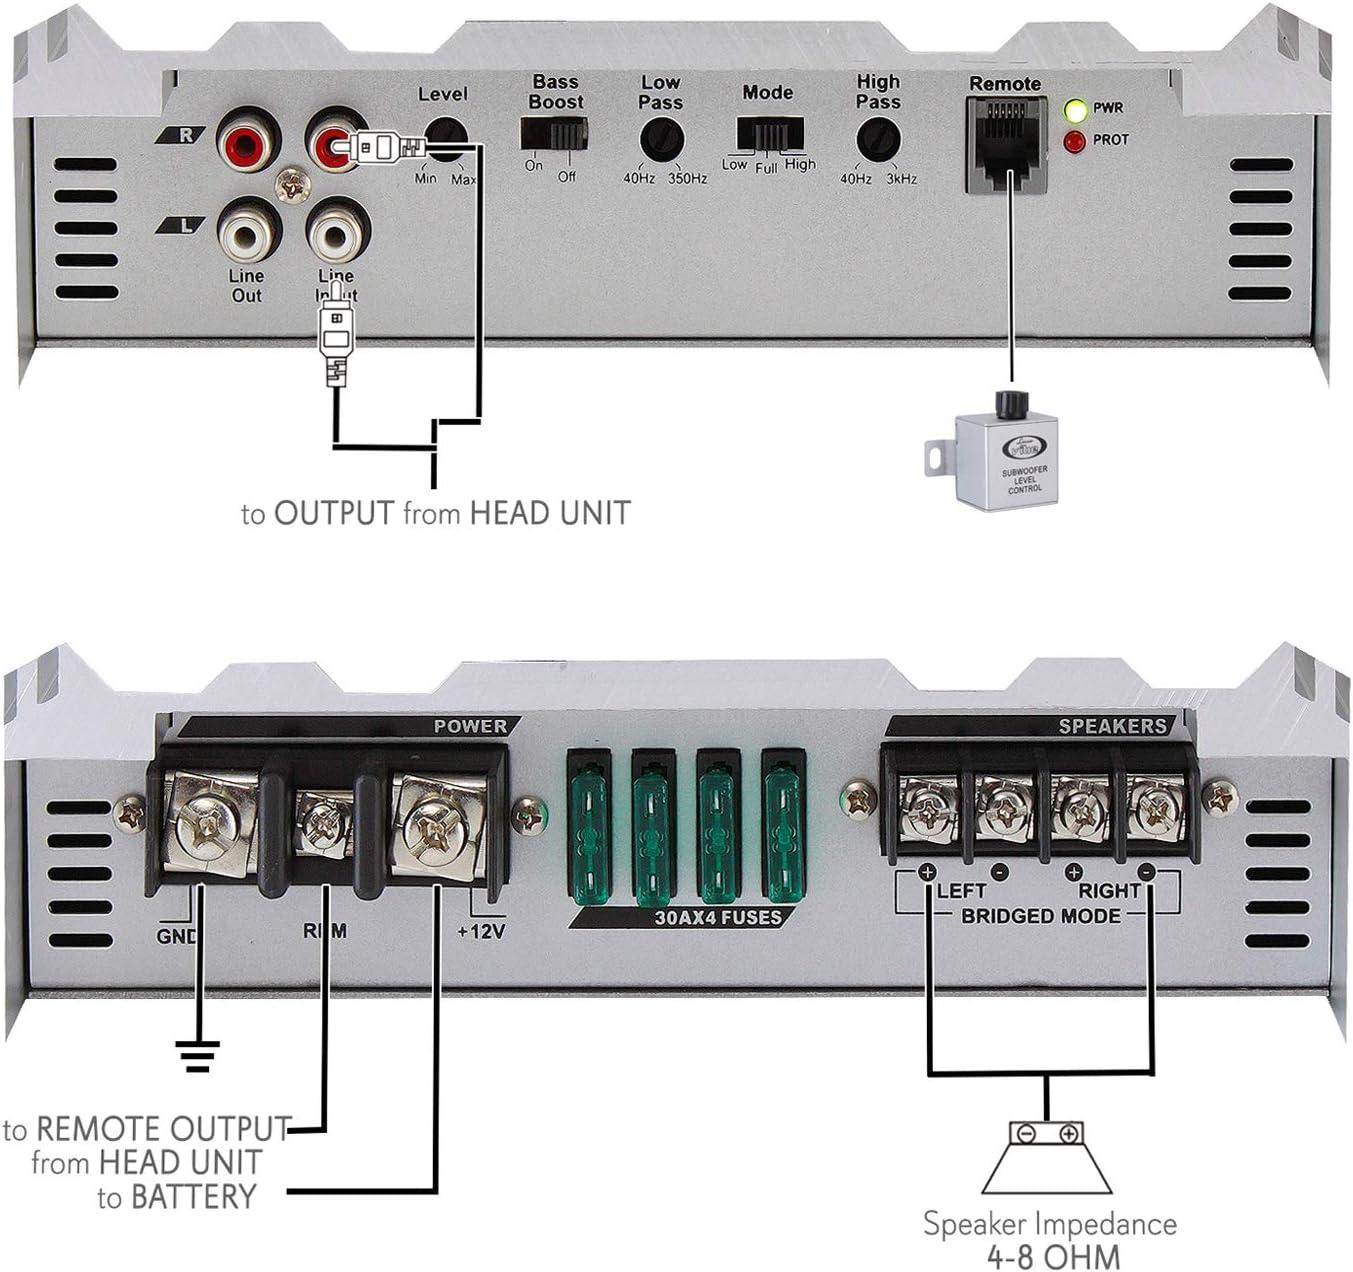 Lanzar VIBE236 Viberant 2 Channel 1000 Watts High Power Mosfet Amplifier